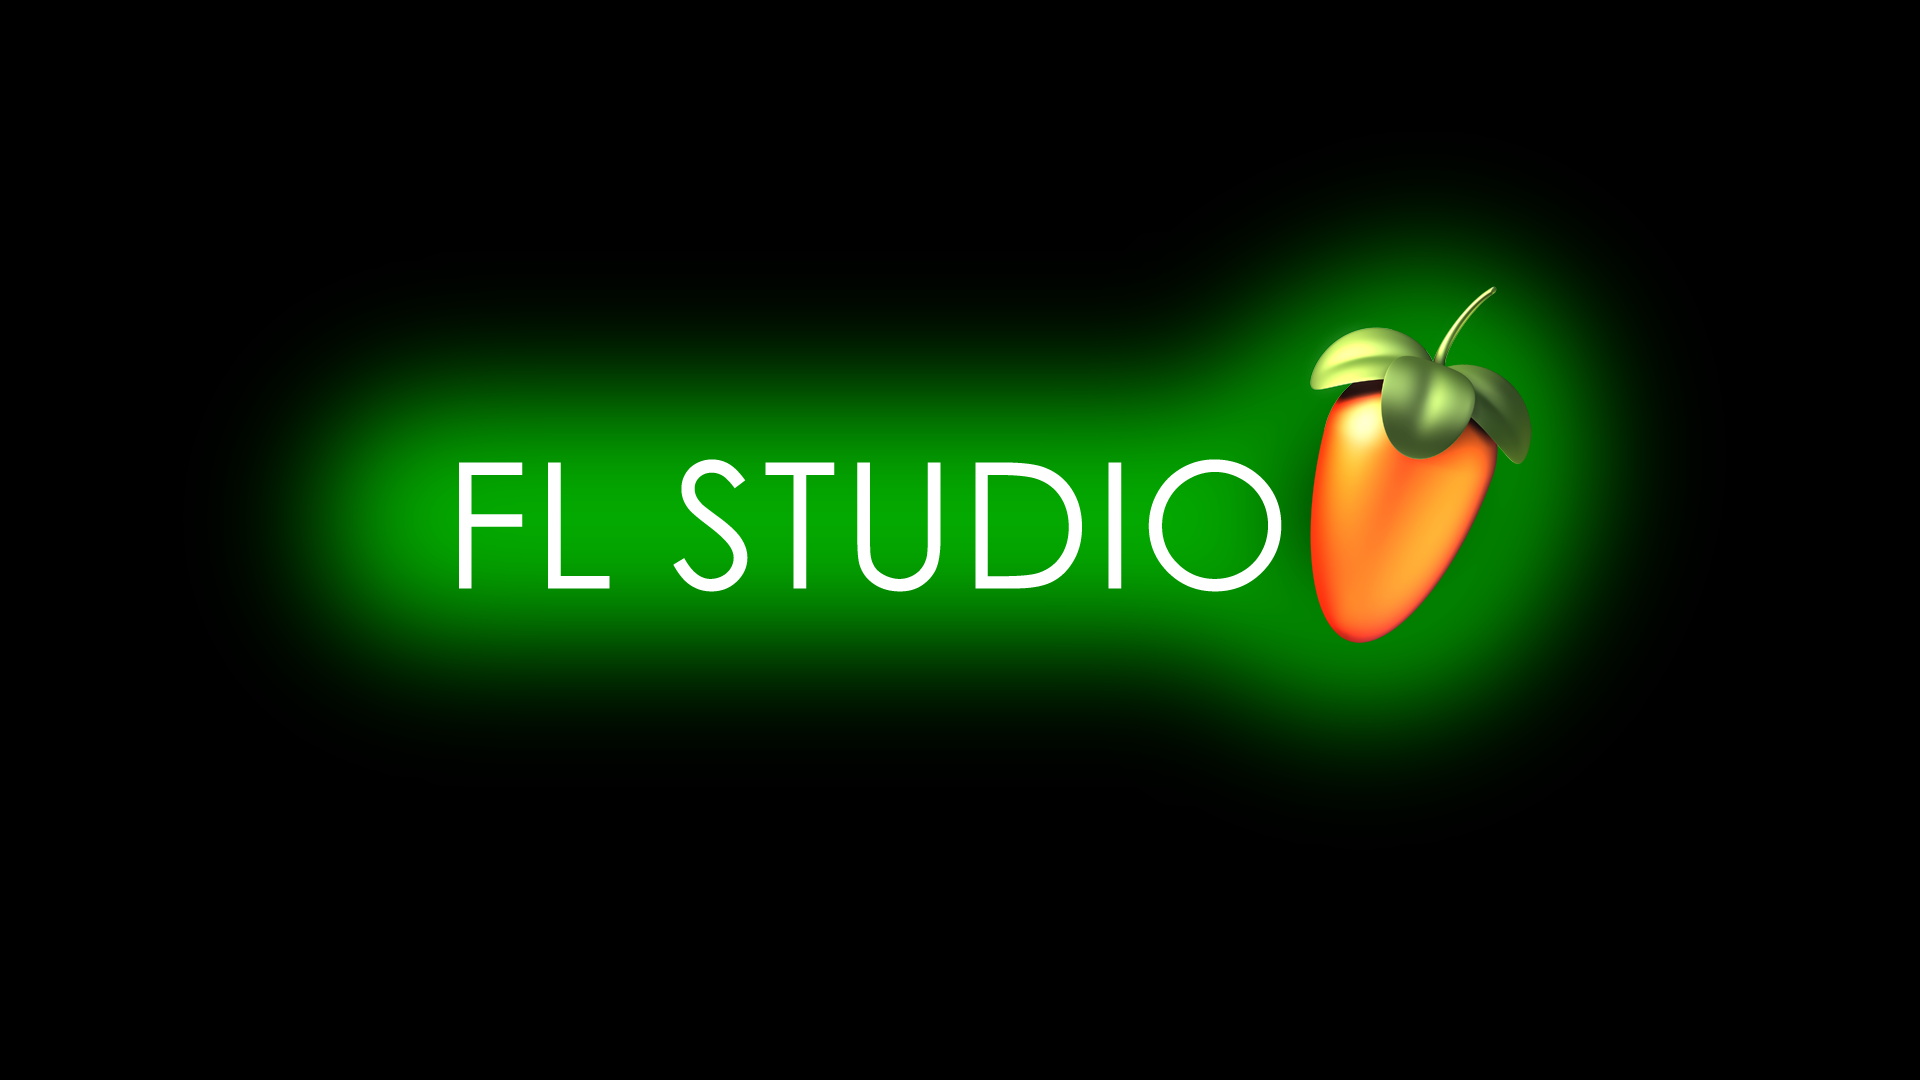 FL Studio 2020 Crack With Keygen Full Version Free Download